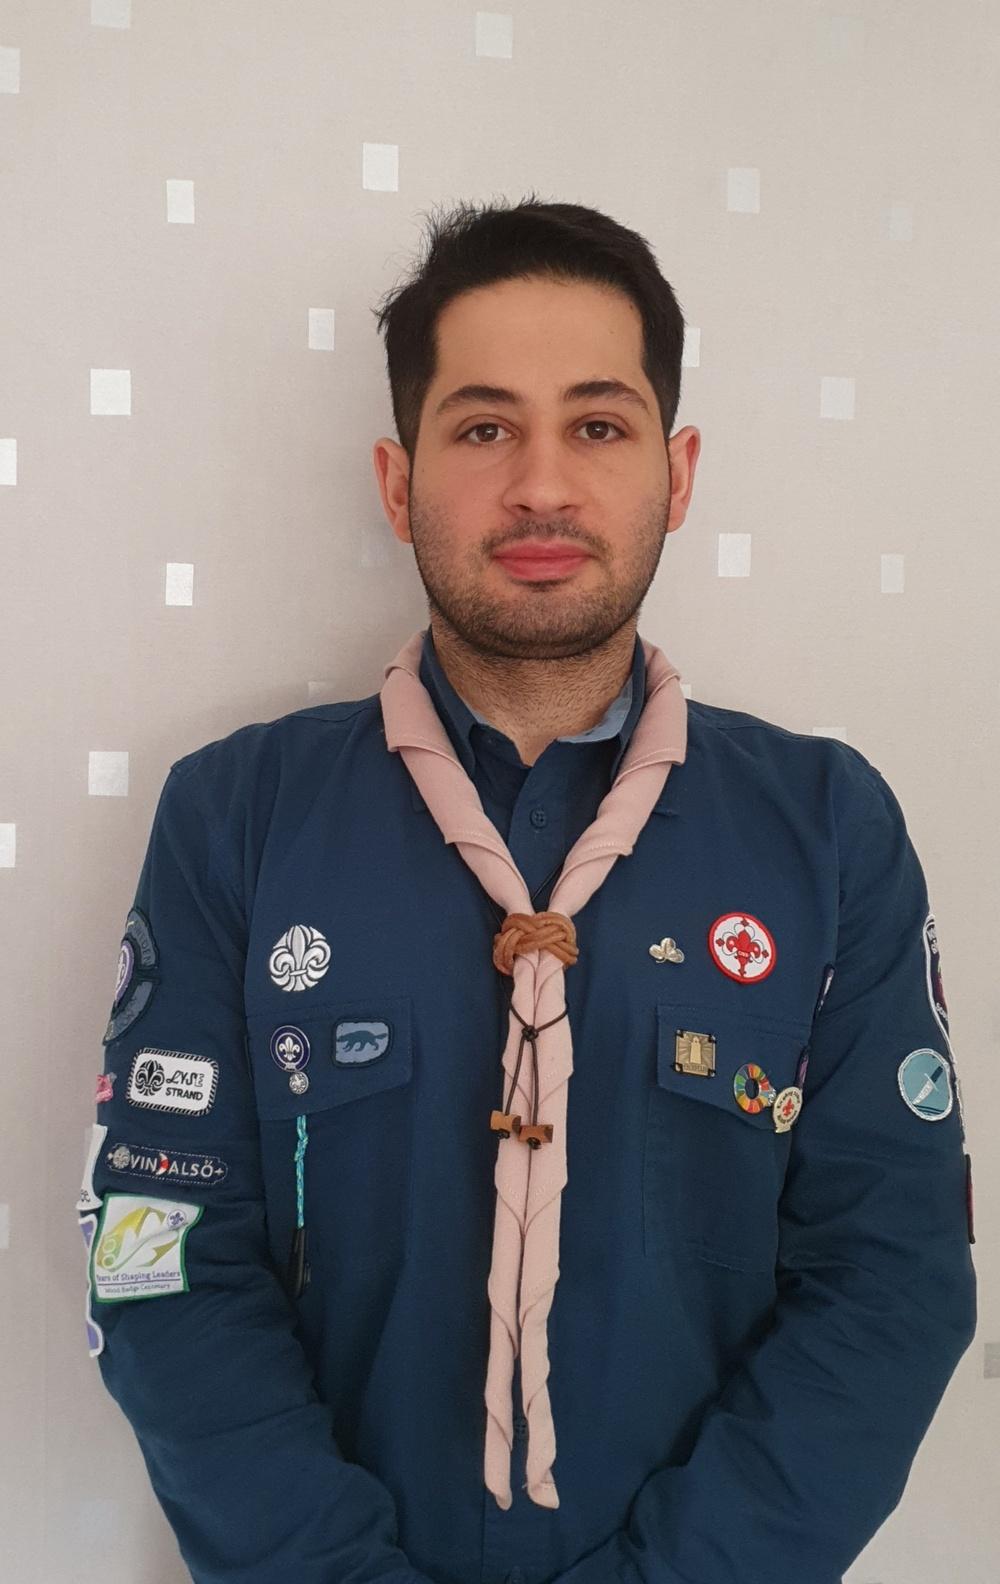 Halvkroppsporträtt på George Chamoun i scoutklädsel.